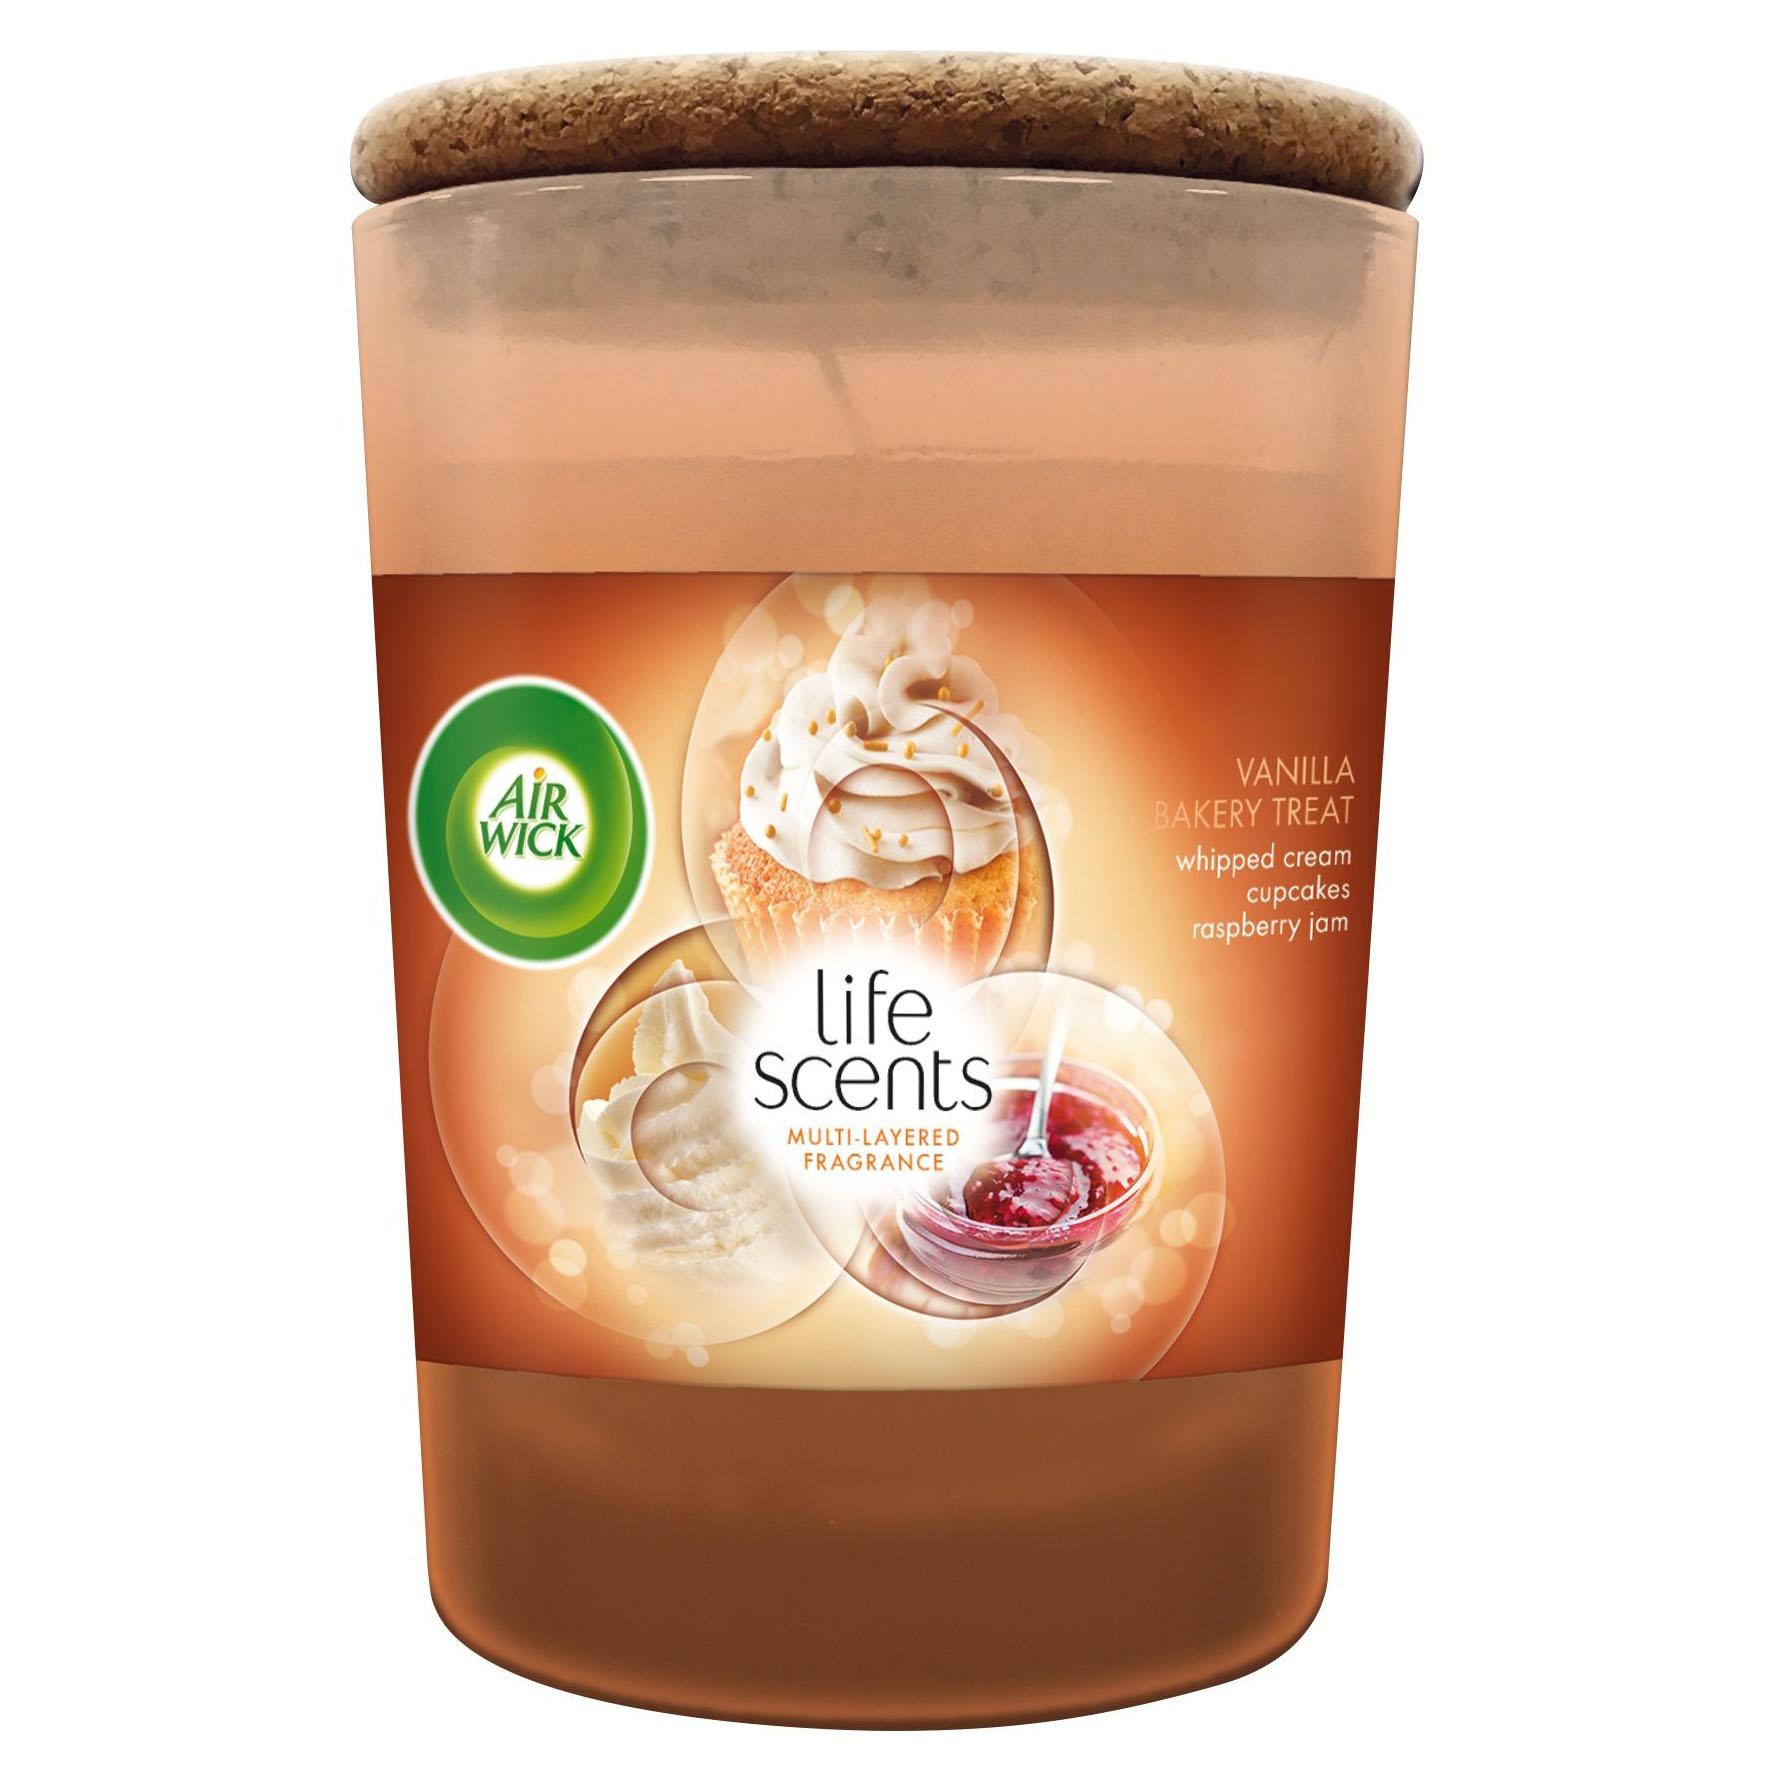 Ly nến thơm tinh dầu Air Wick Vanilla Bakery Treat 185g QT04255 - bánh kem vani